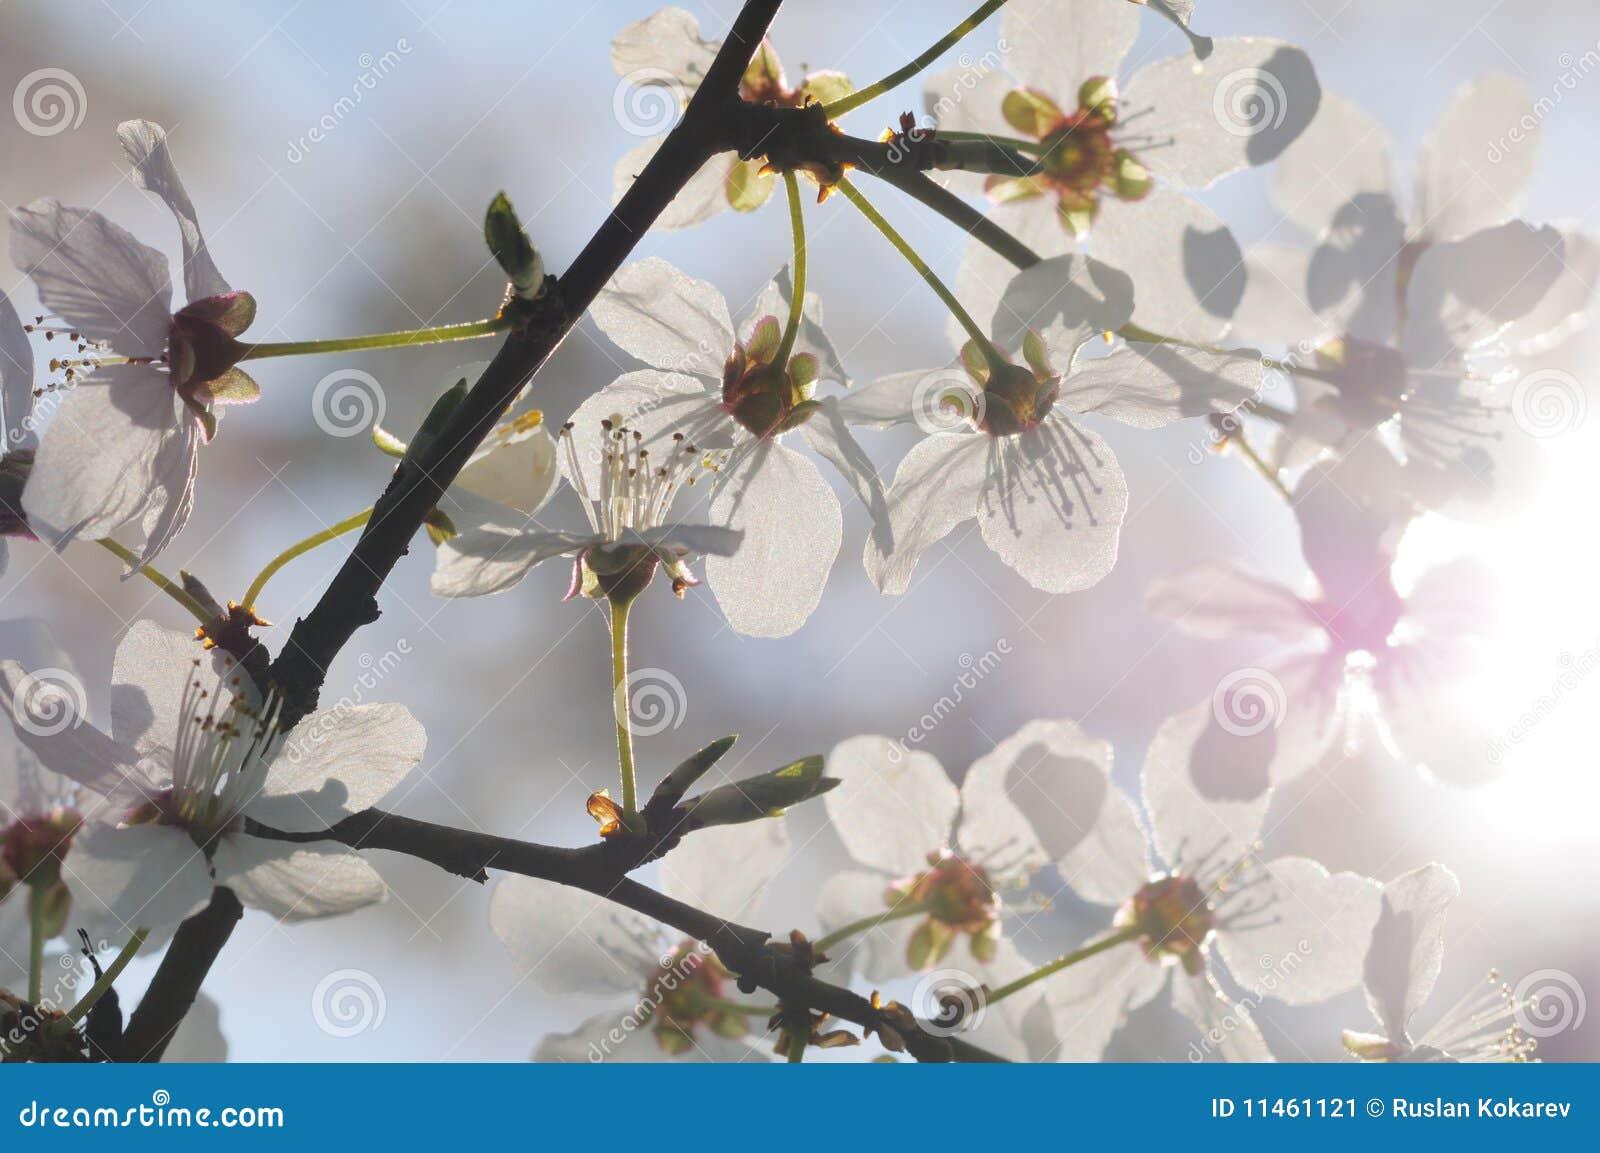 Arbre fruitier en fleur image stock image du cerise for Arbre fruitier